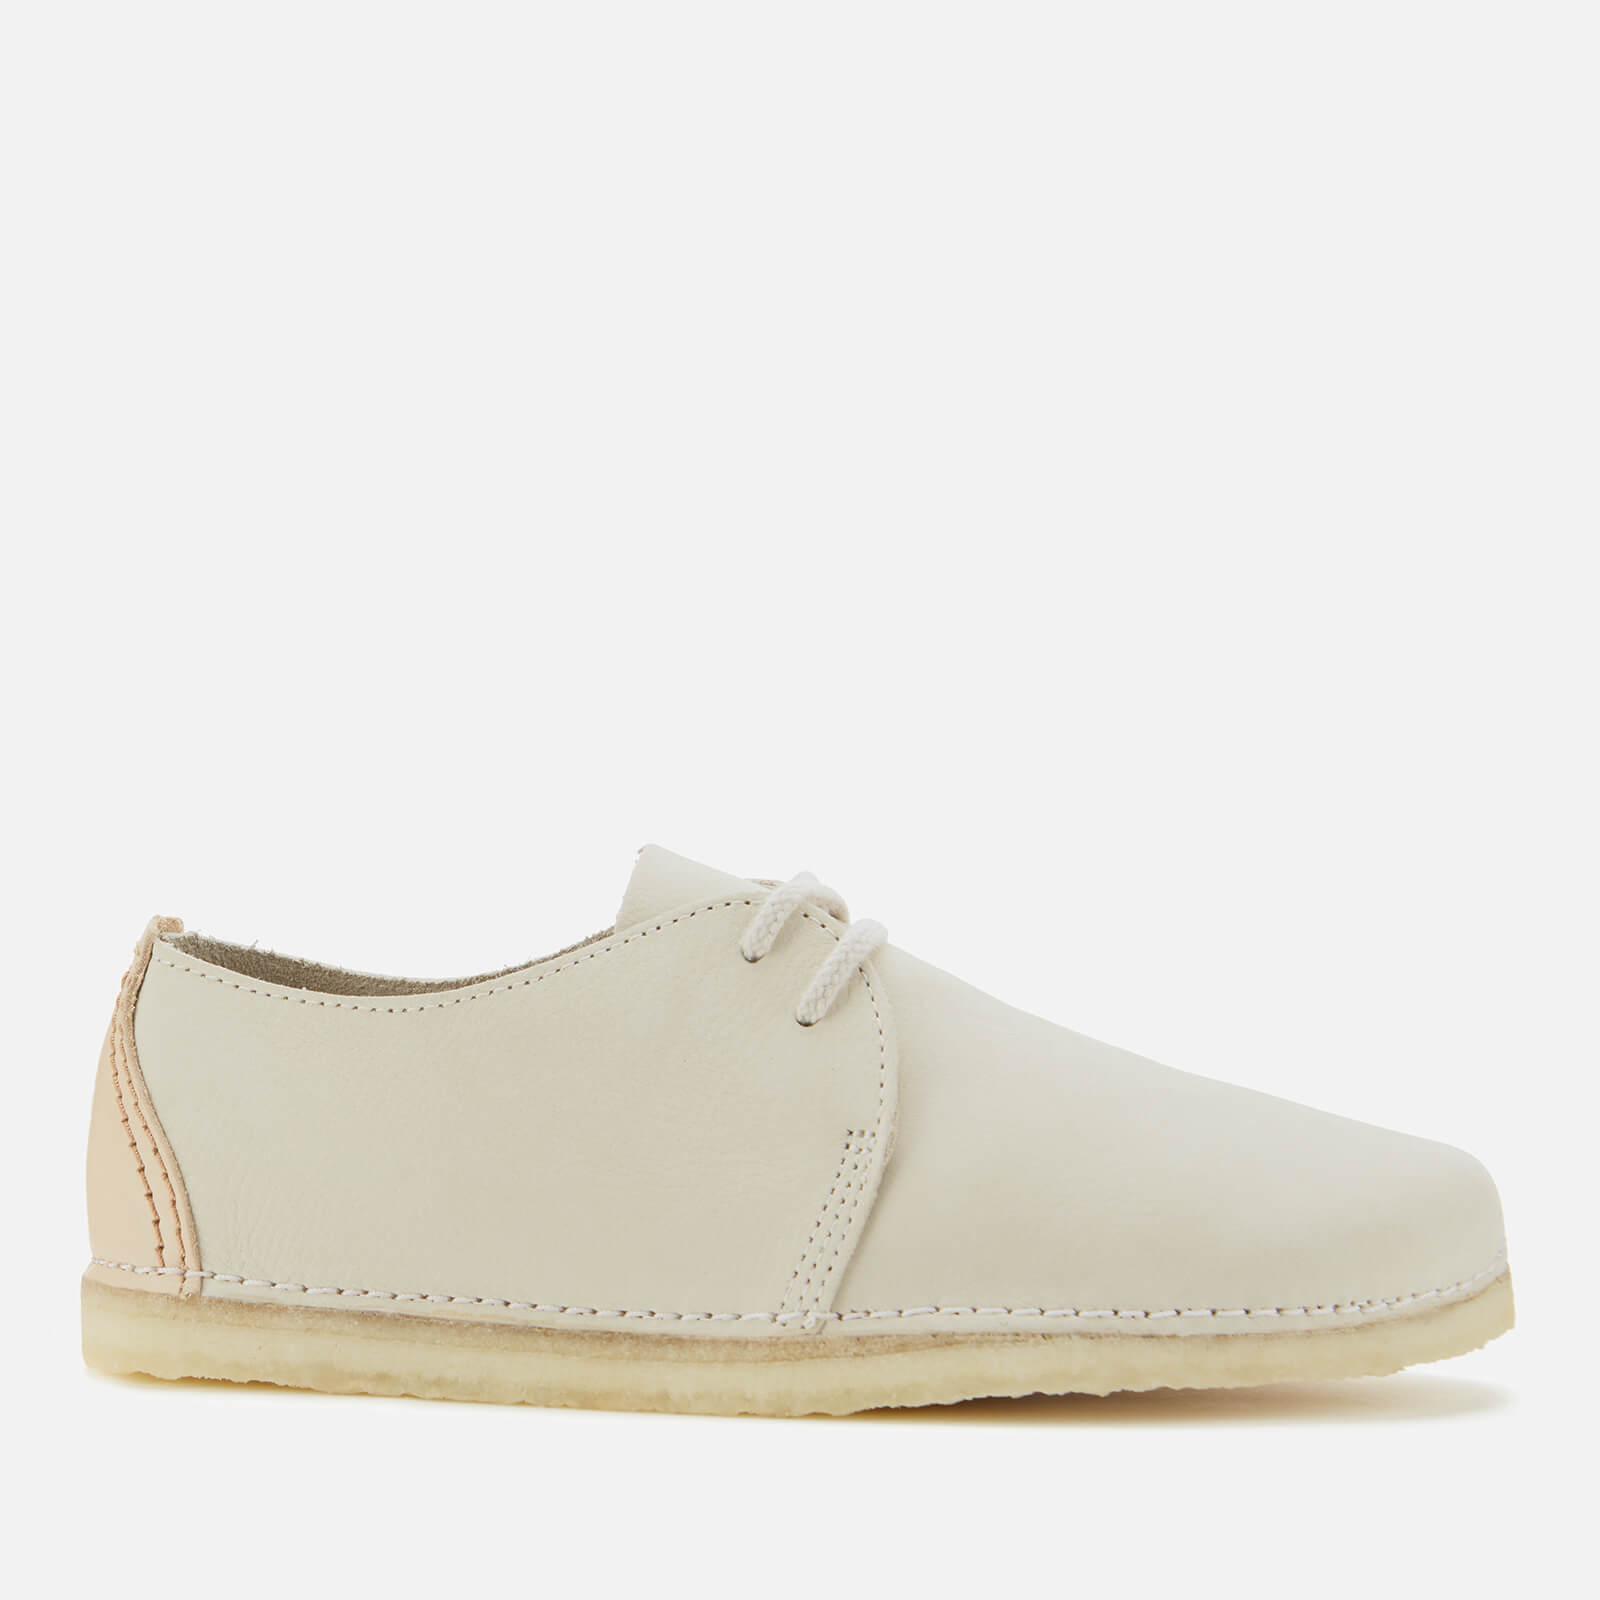 Clarks Originals Women's Ashton Nubuck Flat Shoes - Off White - UK 4